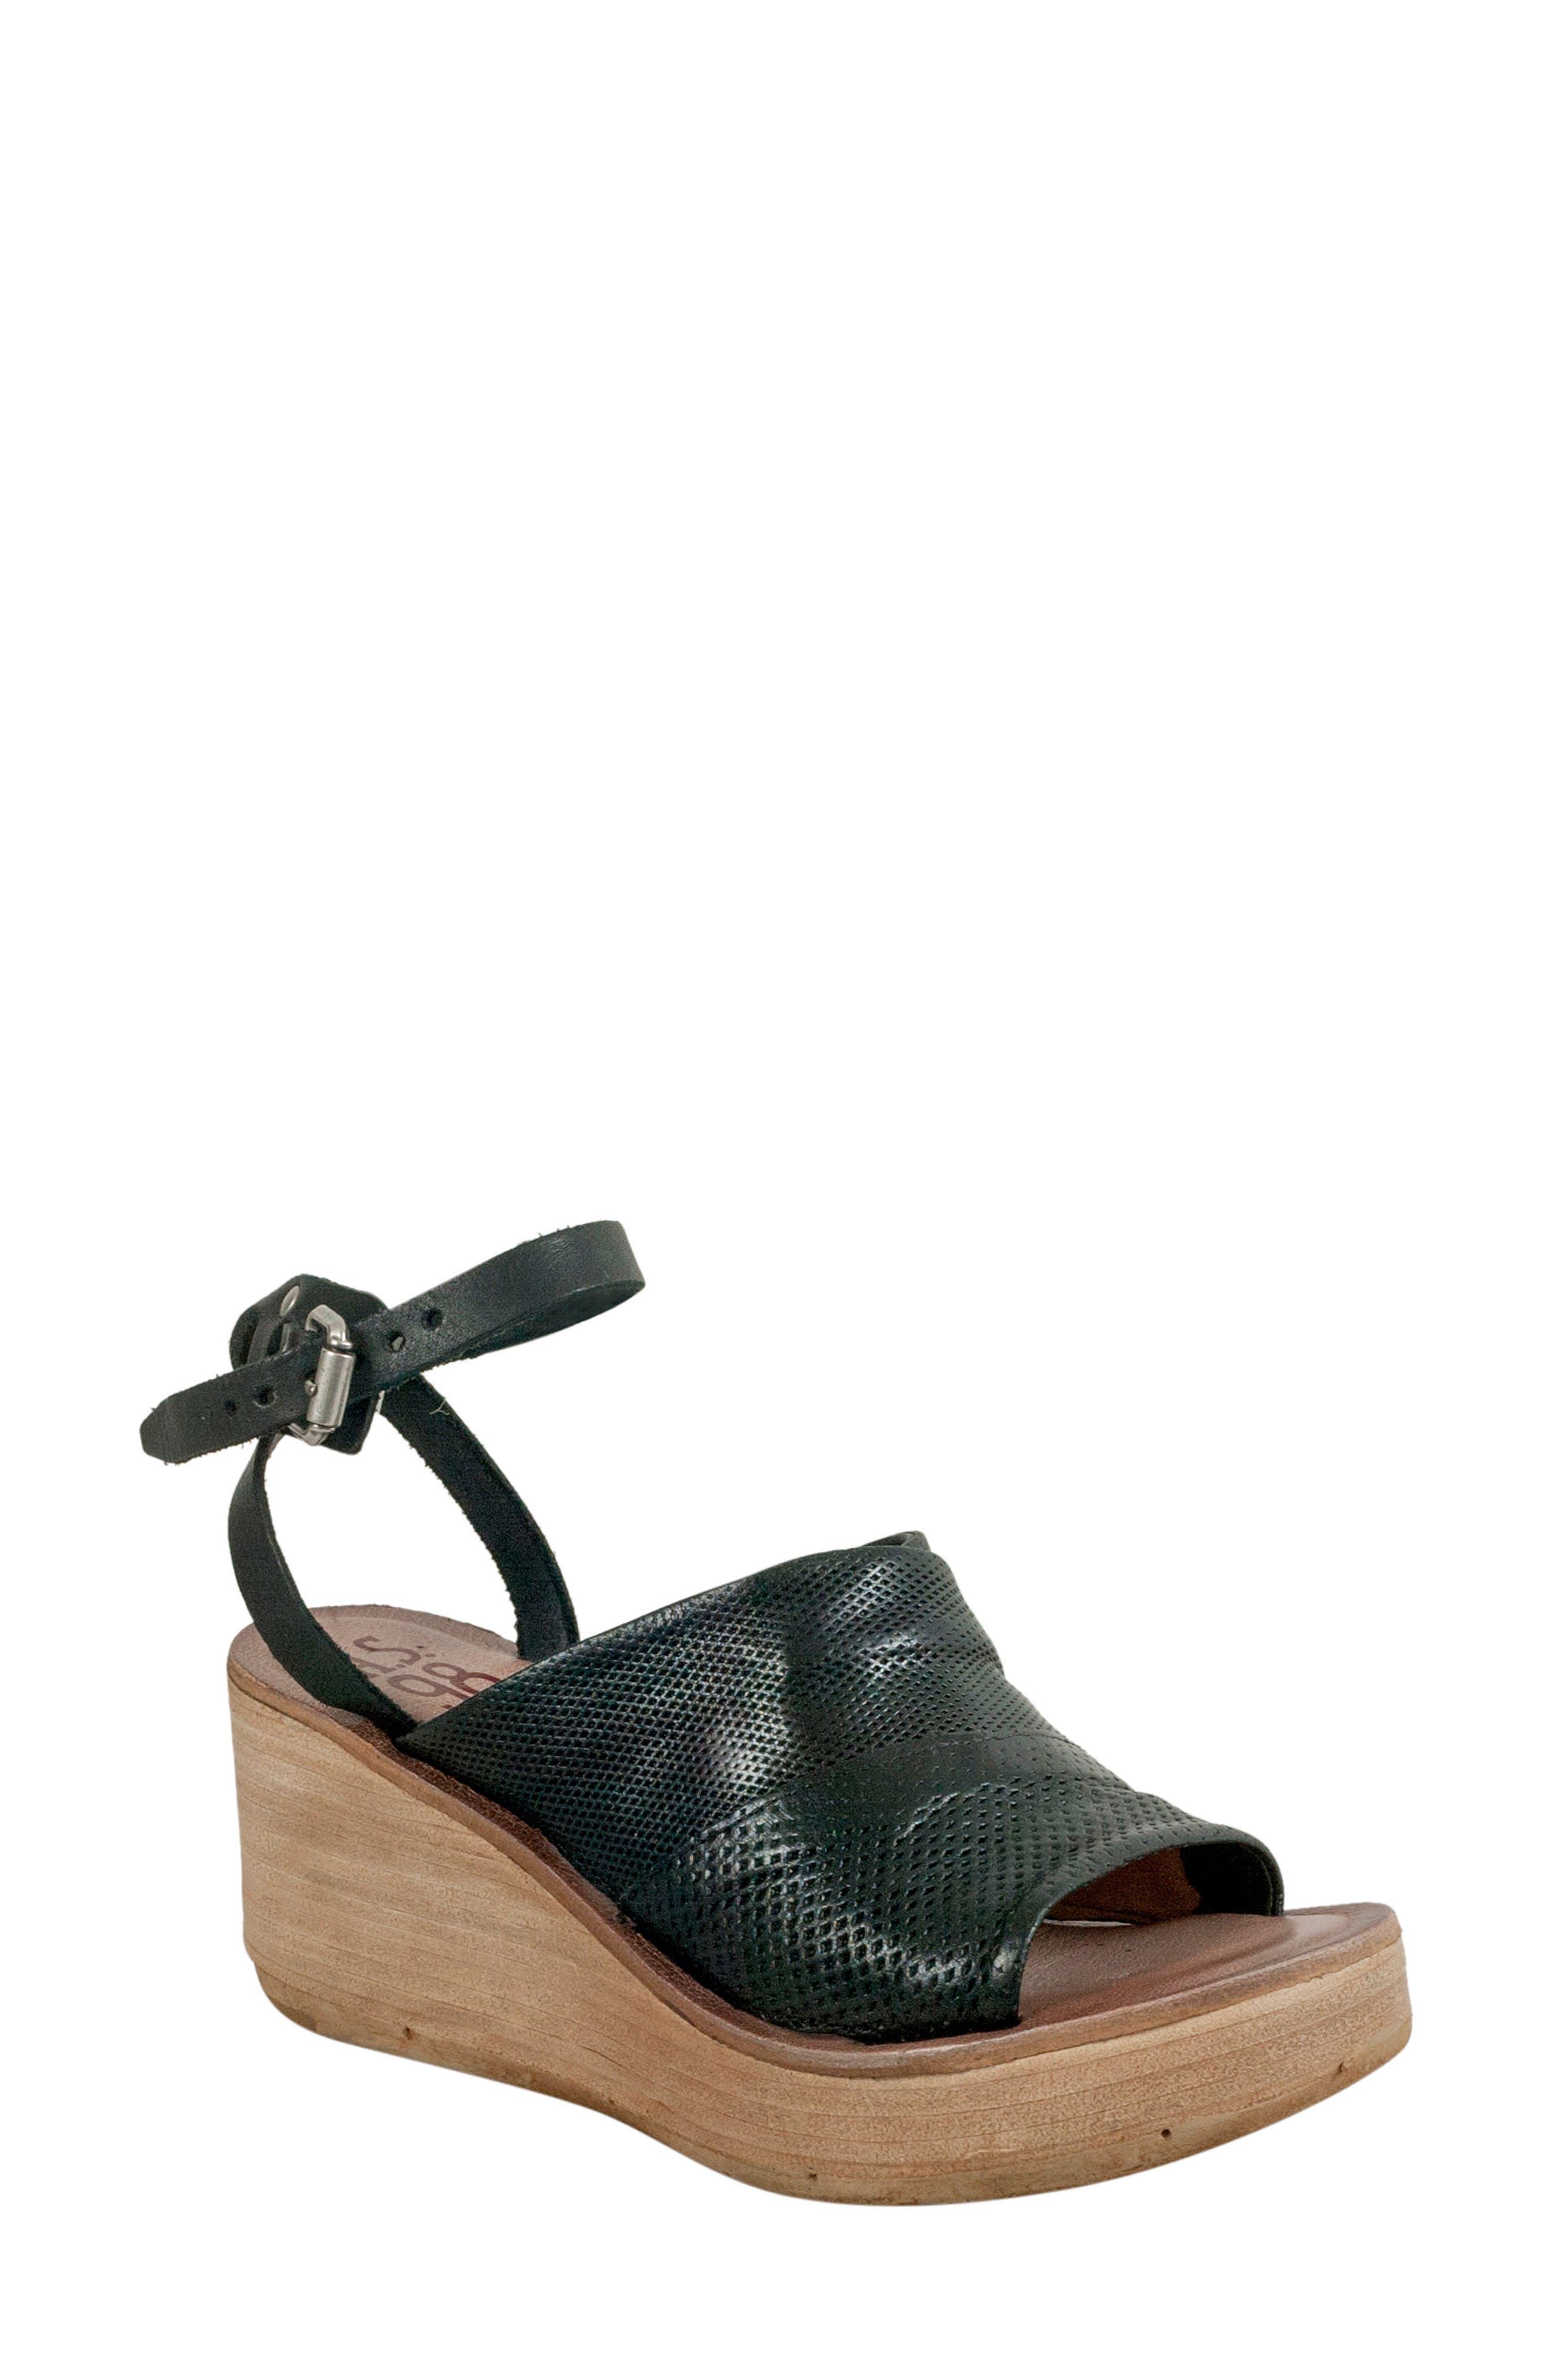 Niall Platform Wedge Sandal,                             Main thumbnail 1, color,